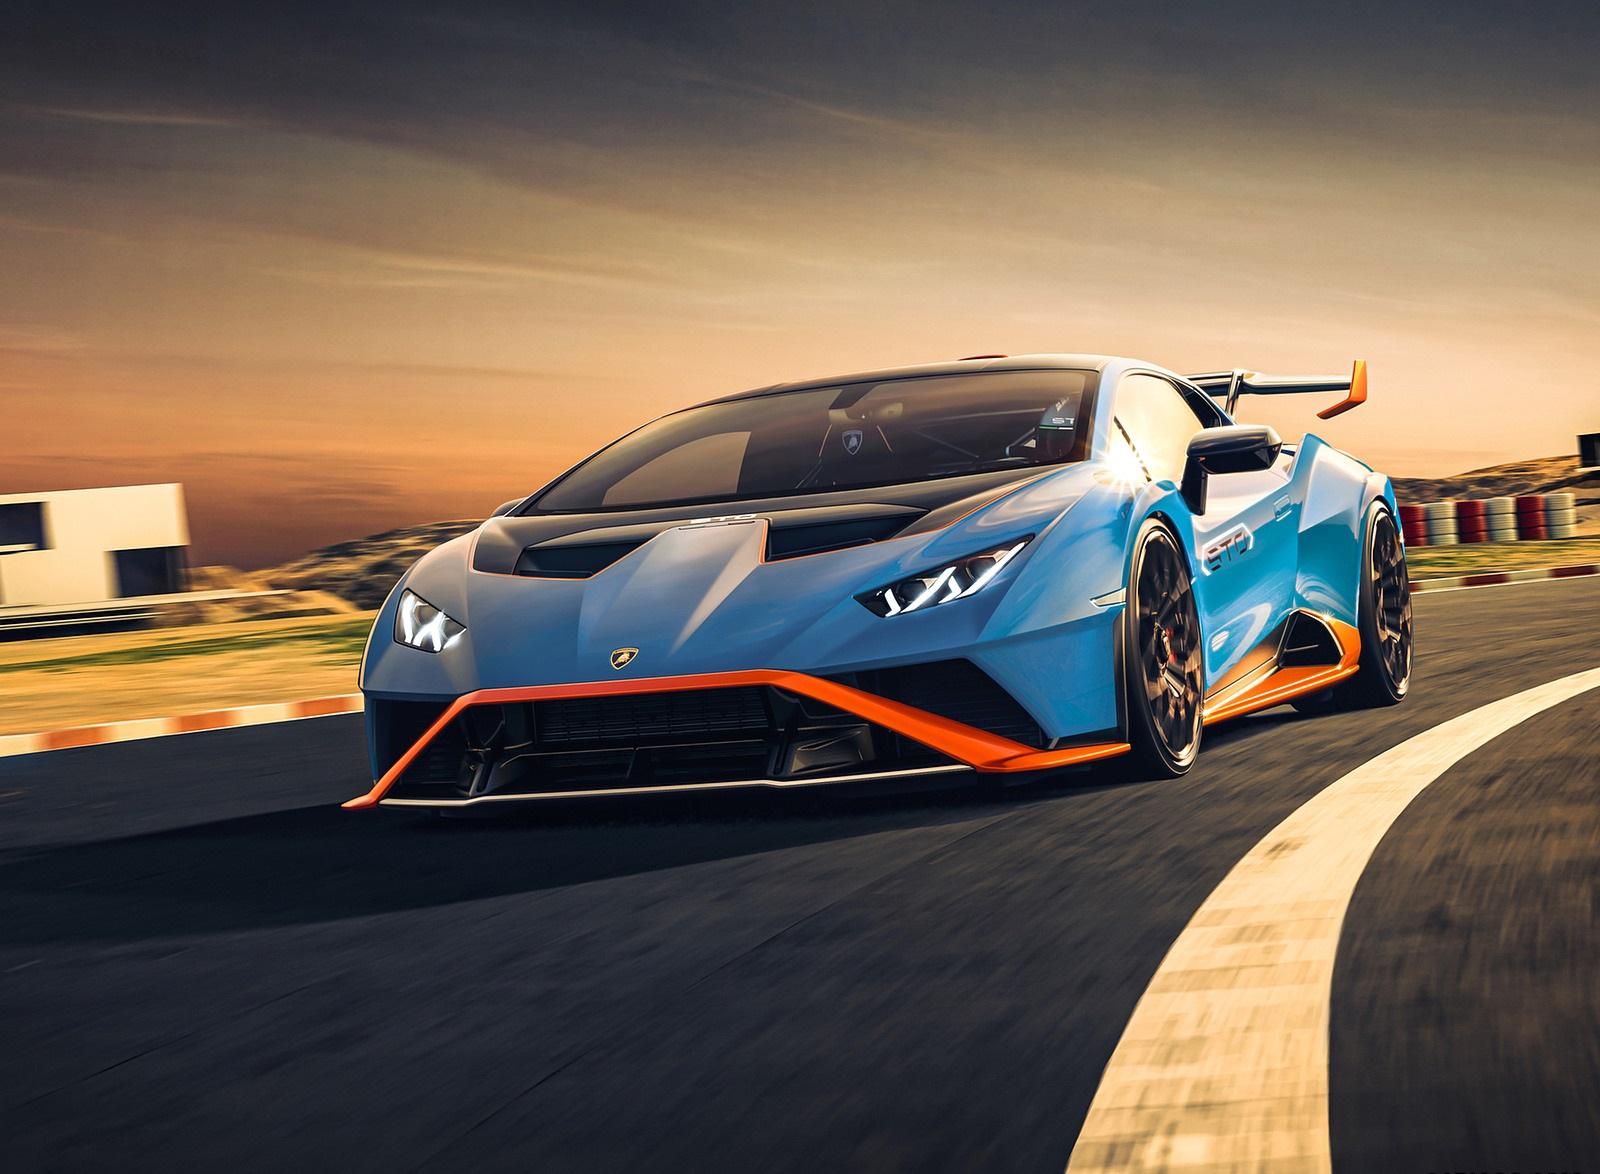 2021 Lamborghini Huracán STO Front Wallpapers (2)